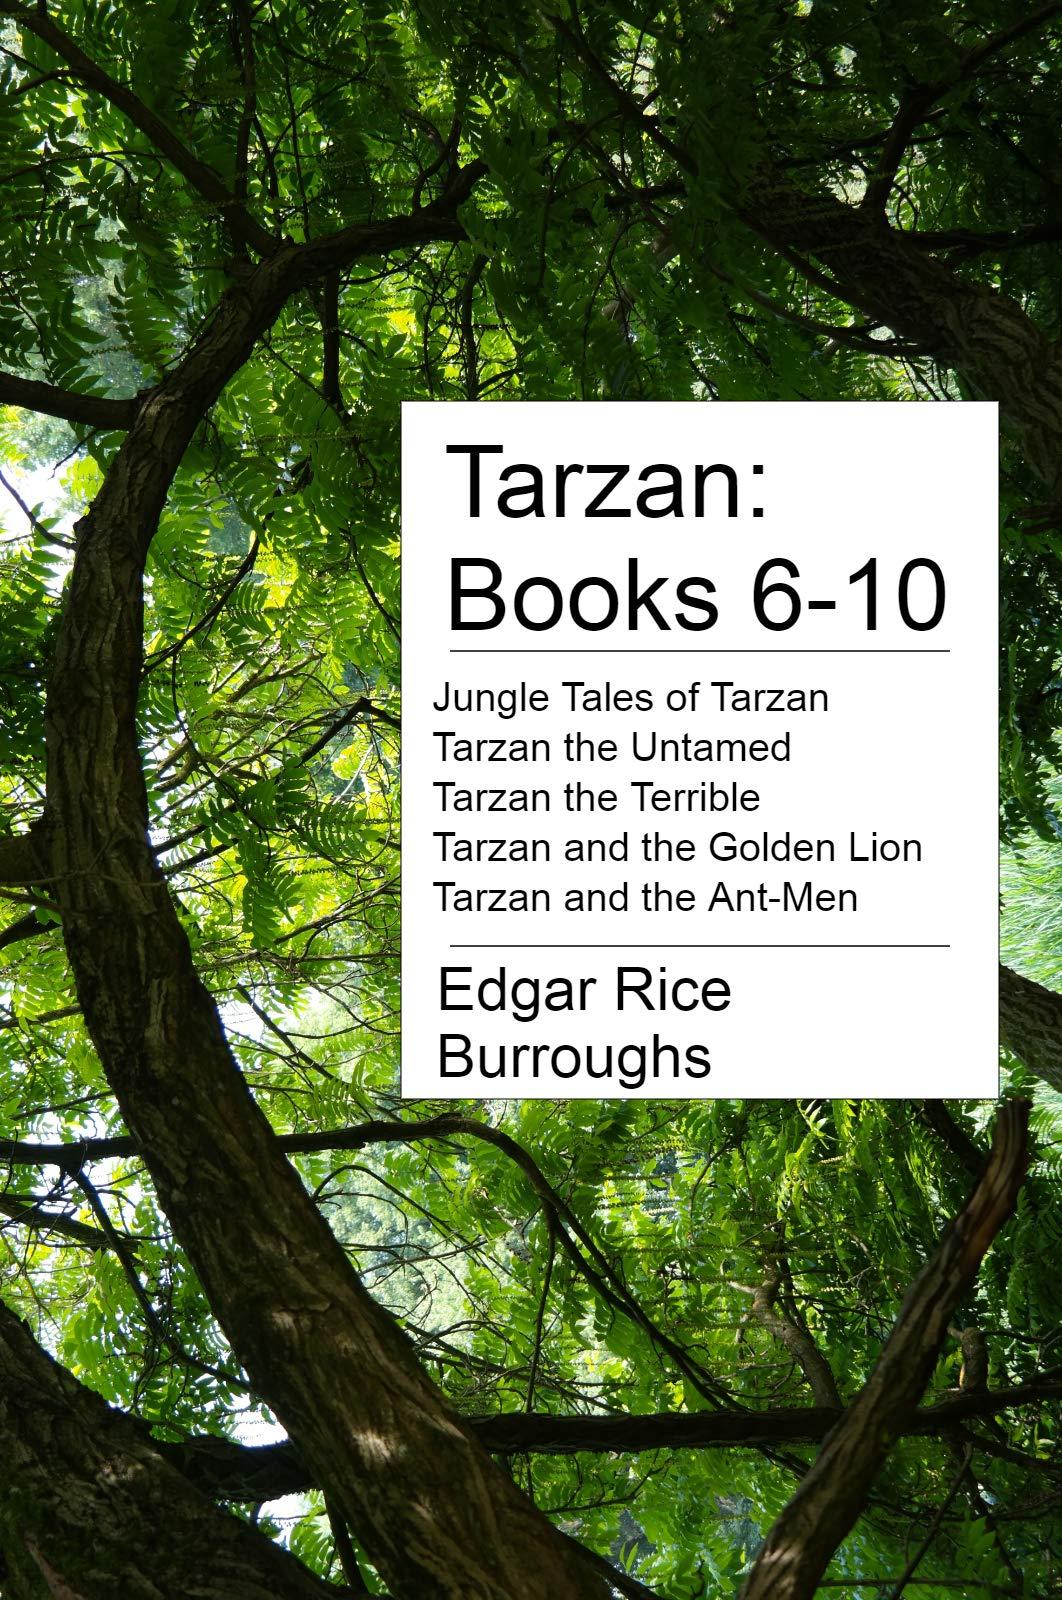 Tarzan: Books 6-10: Jungle Tales of Tarzan, Tarzan the Untamed, Tarzan the Terrible, Tarzan and the Golden Lion, and Tarzan and the Ant-Men